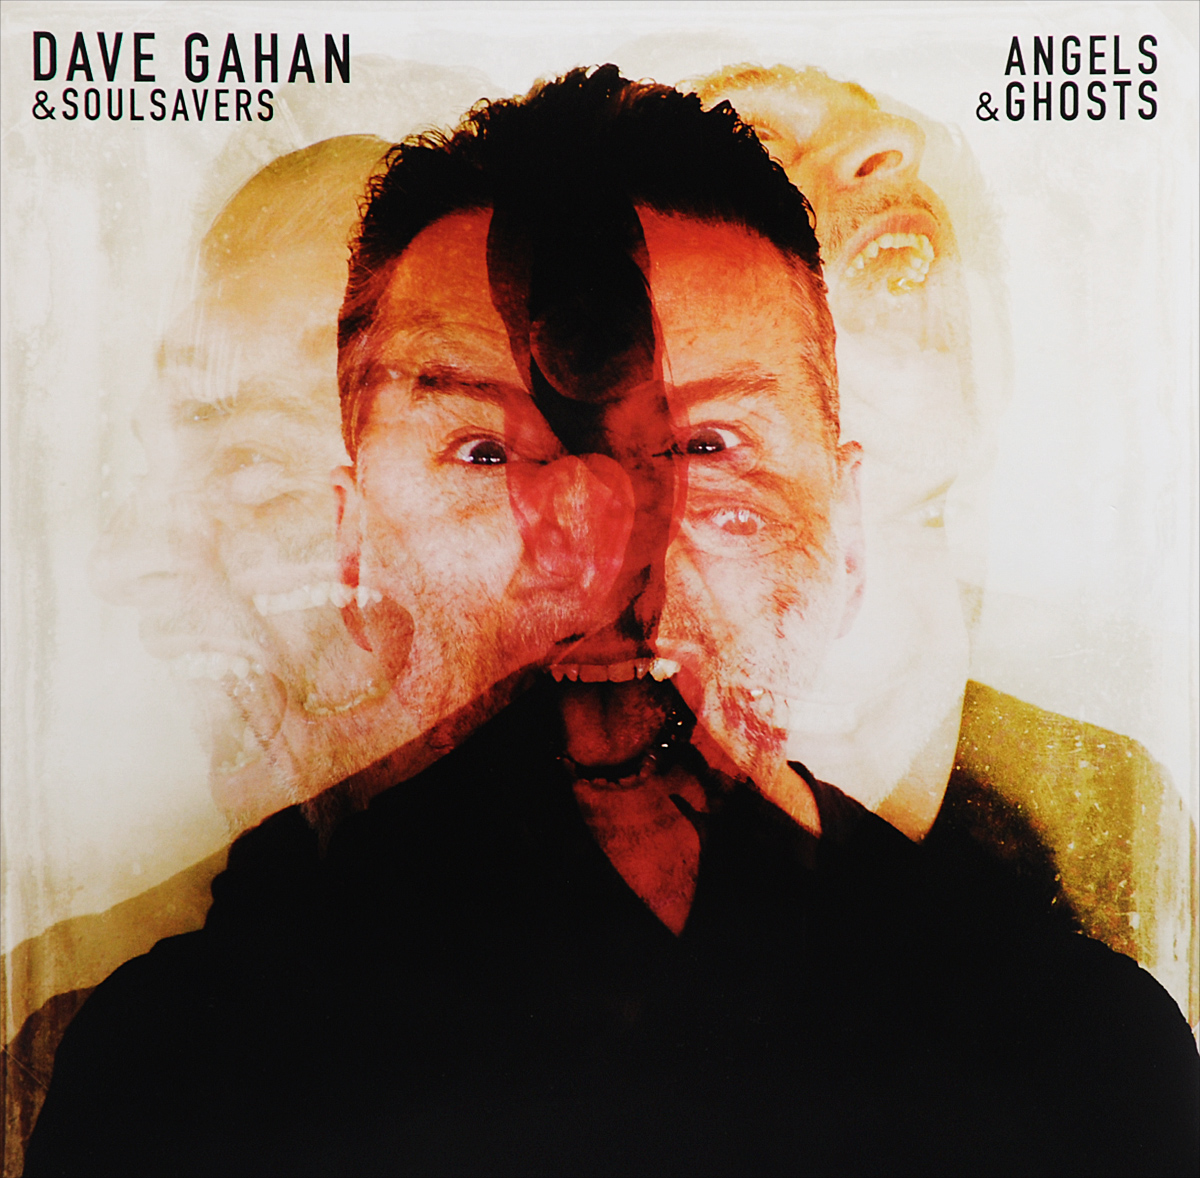 Дэйв Гэхан,Soulsavers Dave Gahan and Soulsavers. Angels & Ghosts (LP) roxy music roxy music the studio albums limited edition 8 lp